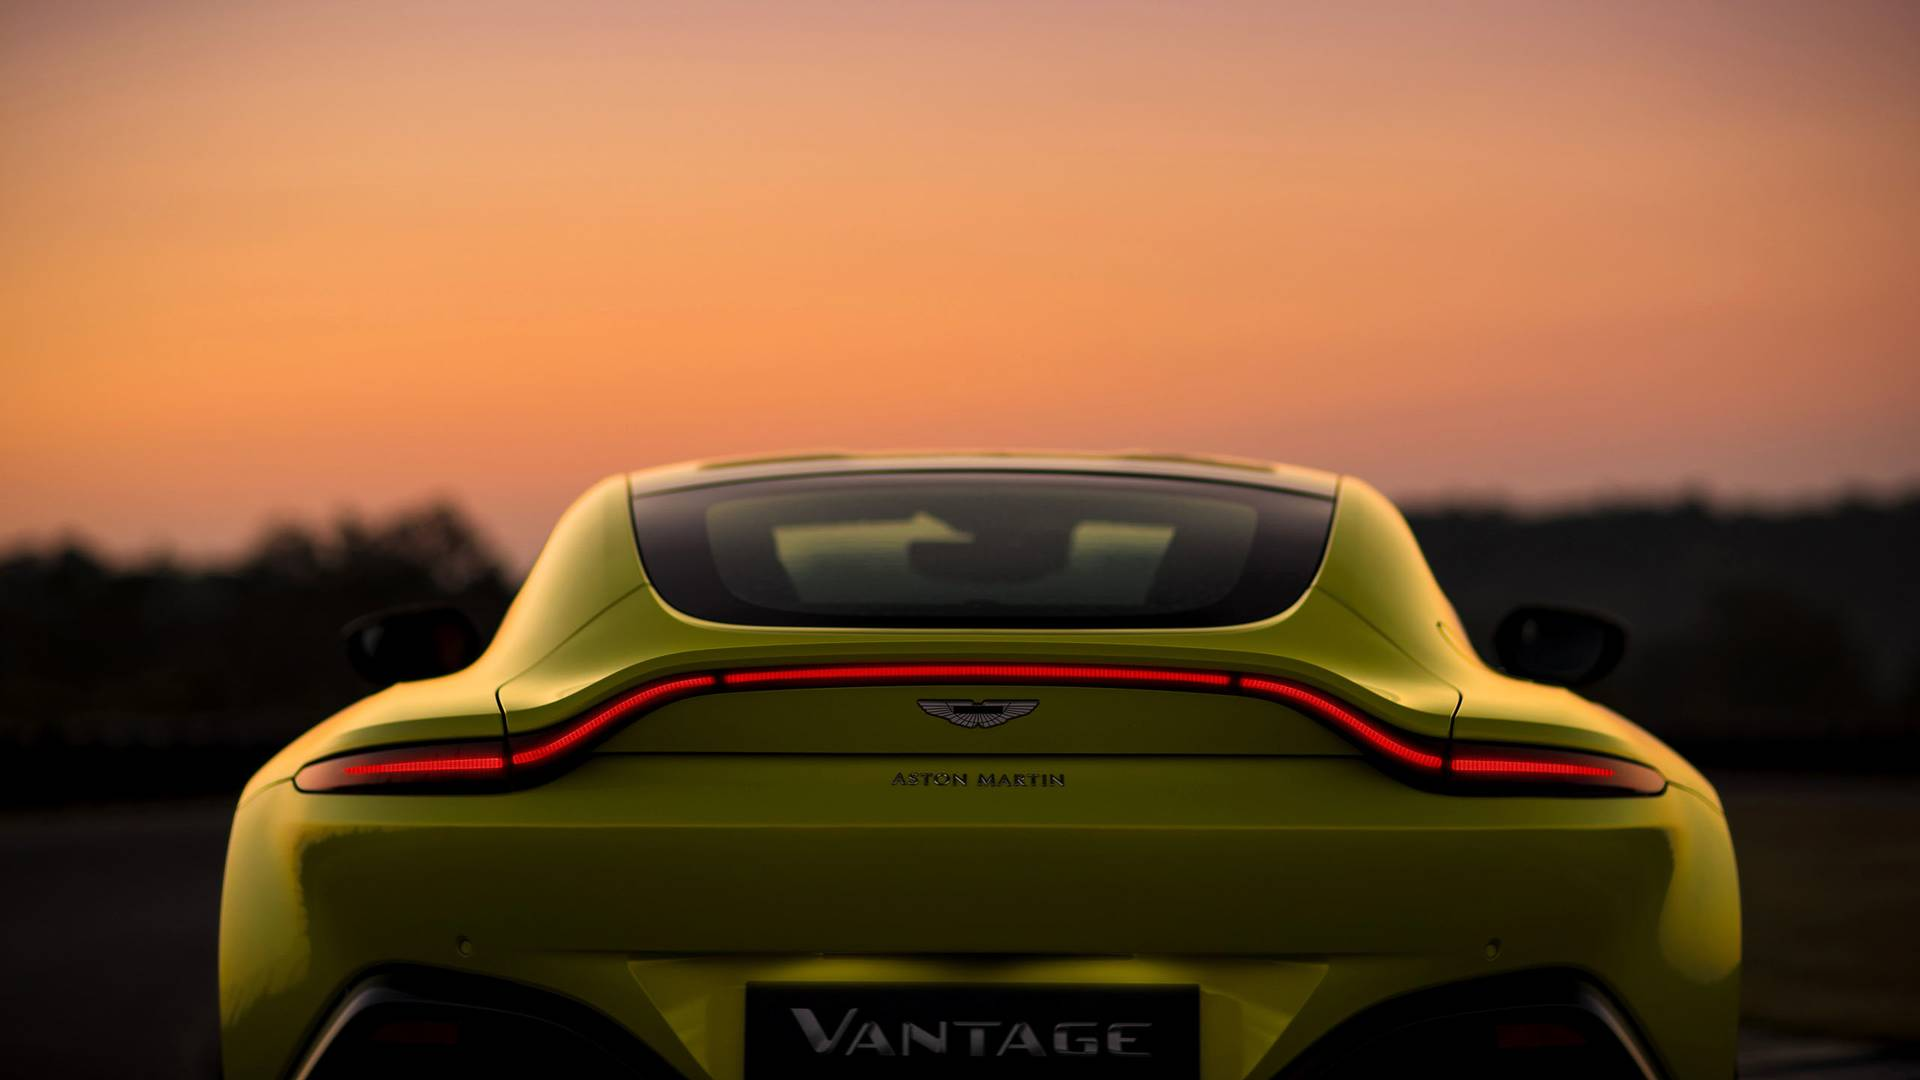 5a1431cd7ec07 2018 aston martin vantage مدل جدید استون مارتین Vantage 503 HP رونمایی کرد   اجاره ماشین